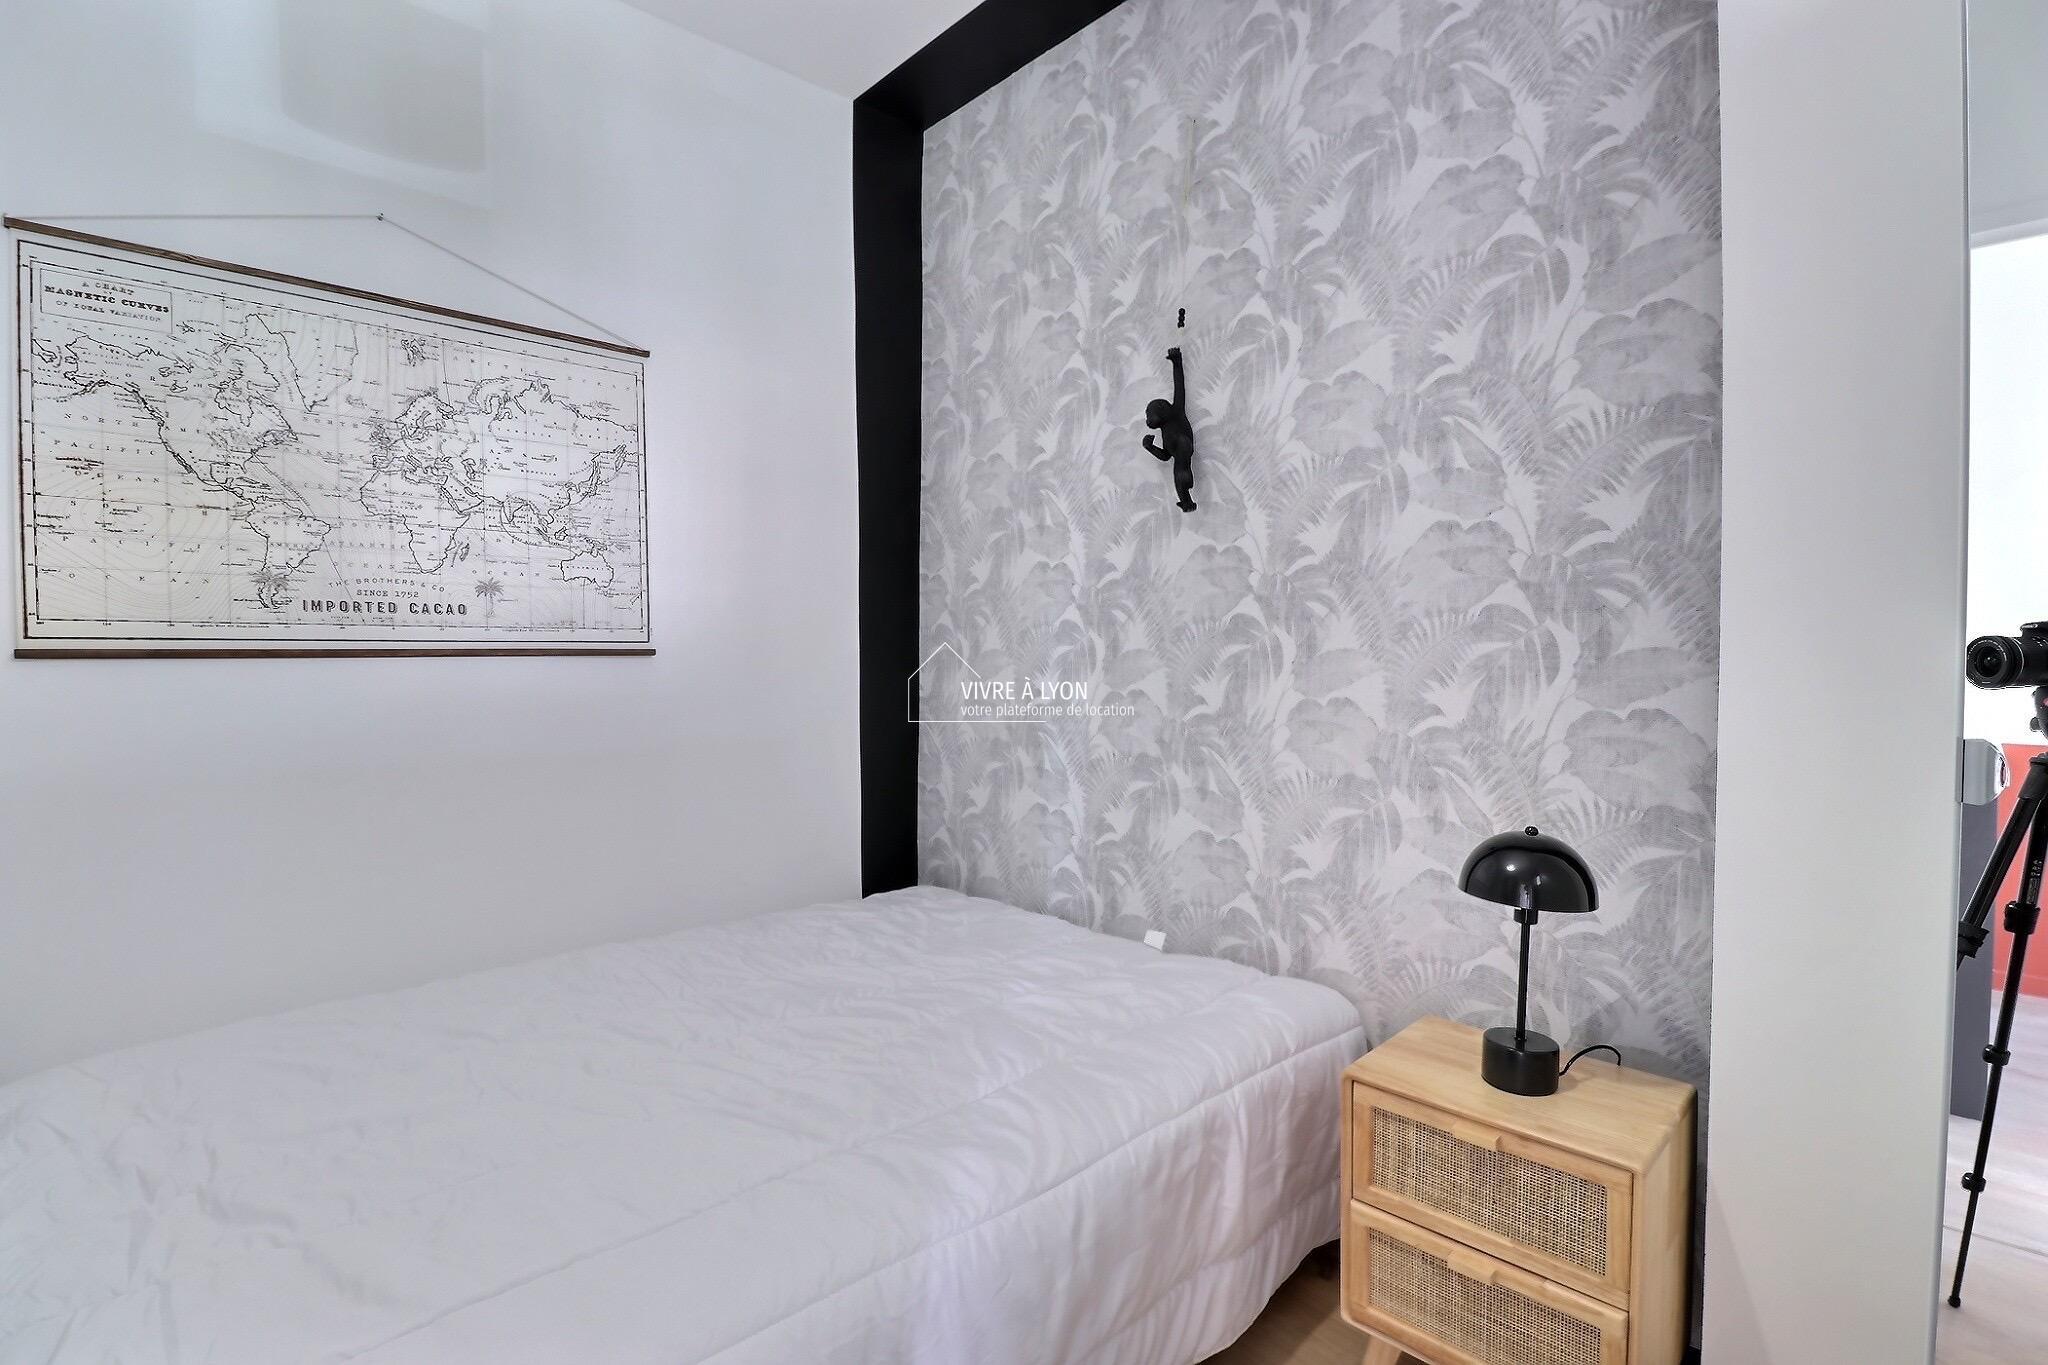 location lyon meublé